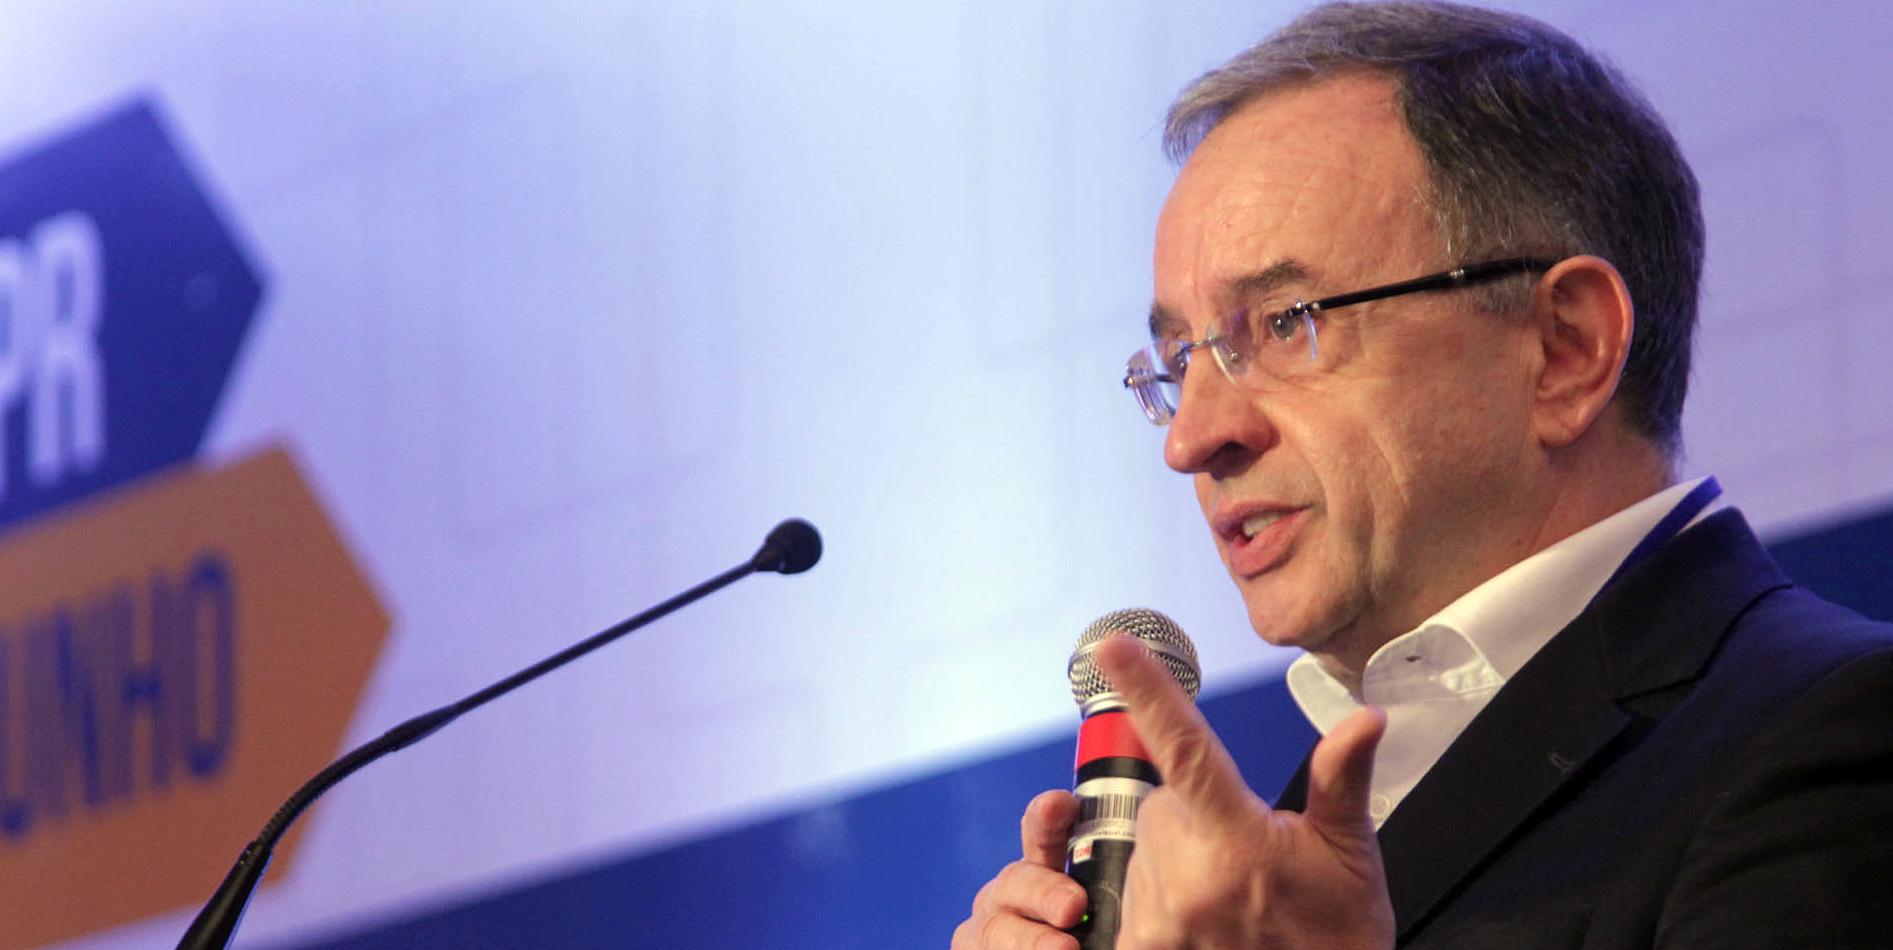 Jose Carlos Martins